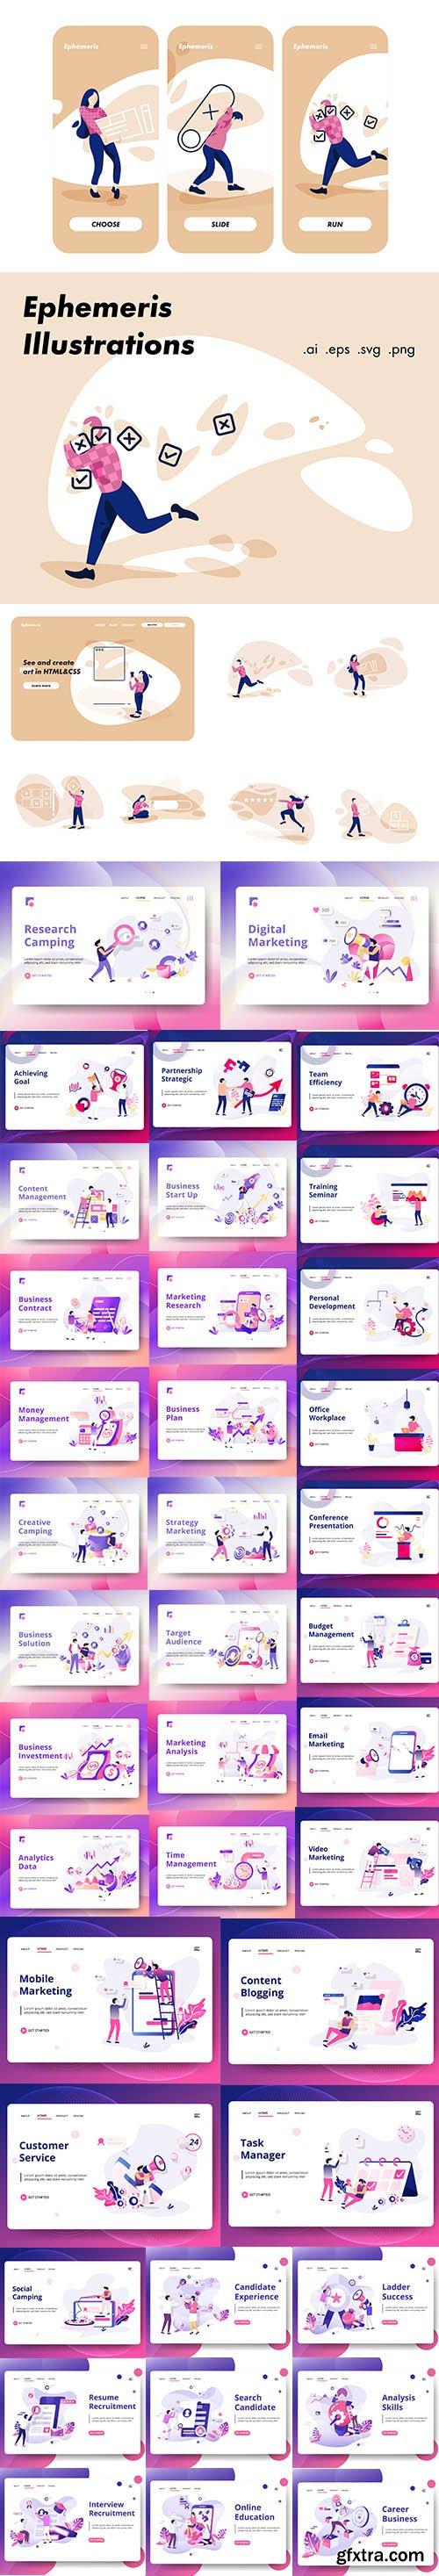 Vector Illustrations Set - Ephemeris, Corporate Management and Business Marketing Landing Page